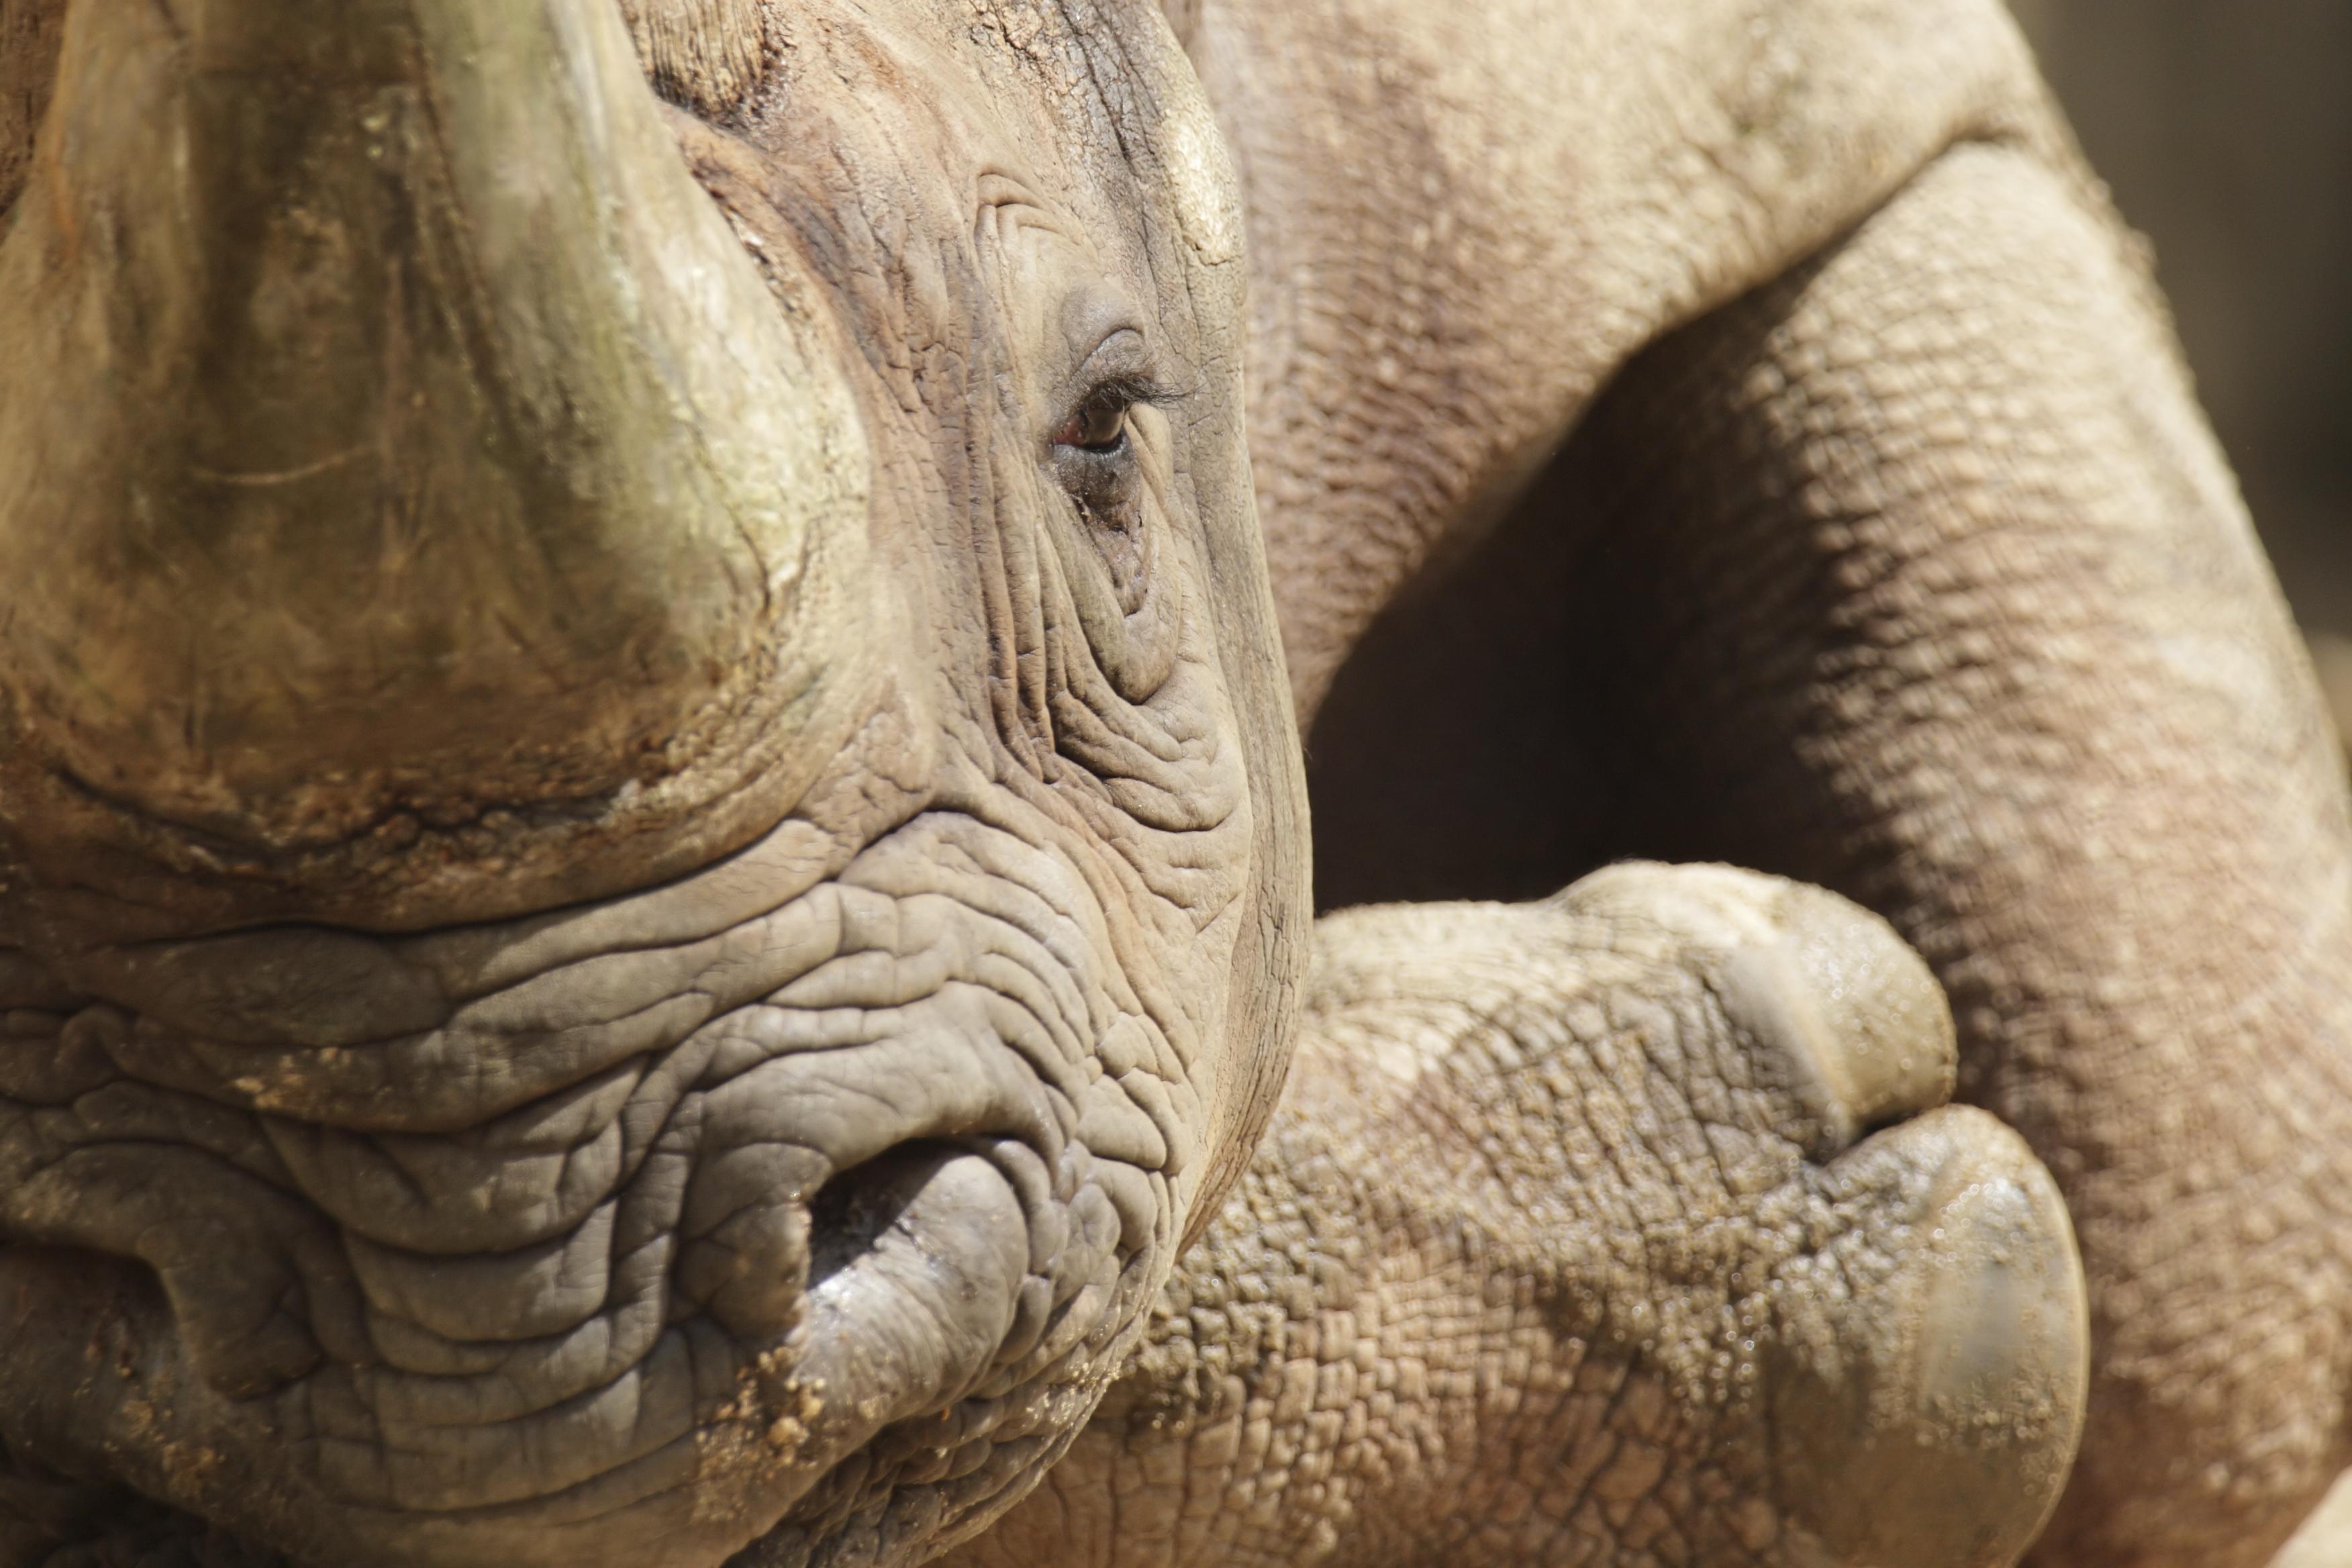 Black rhino closeup, rhino conservation